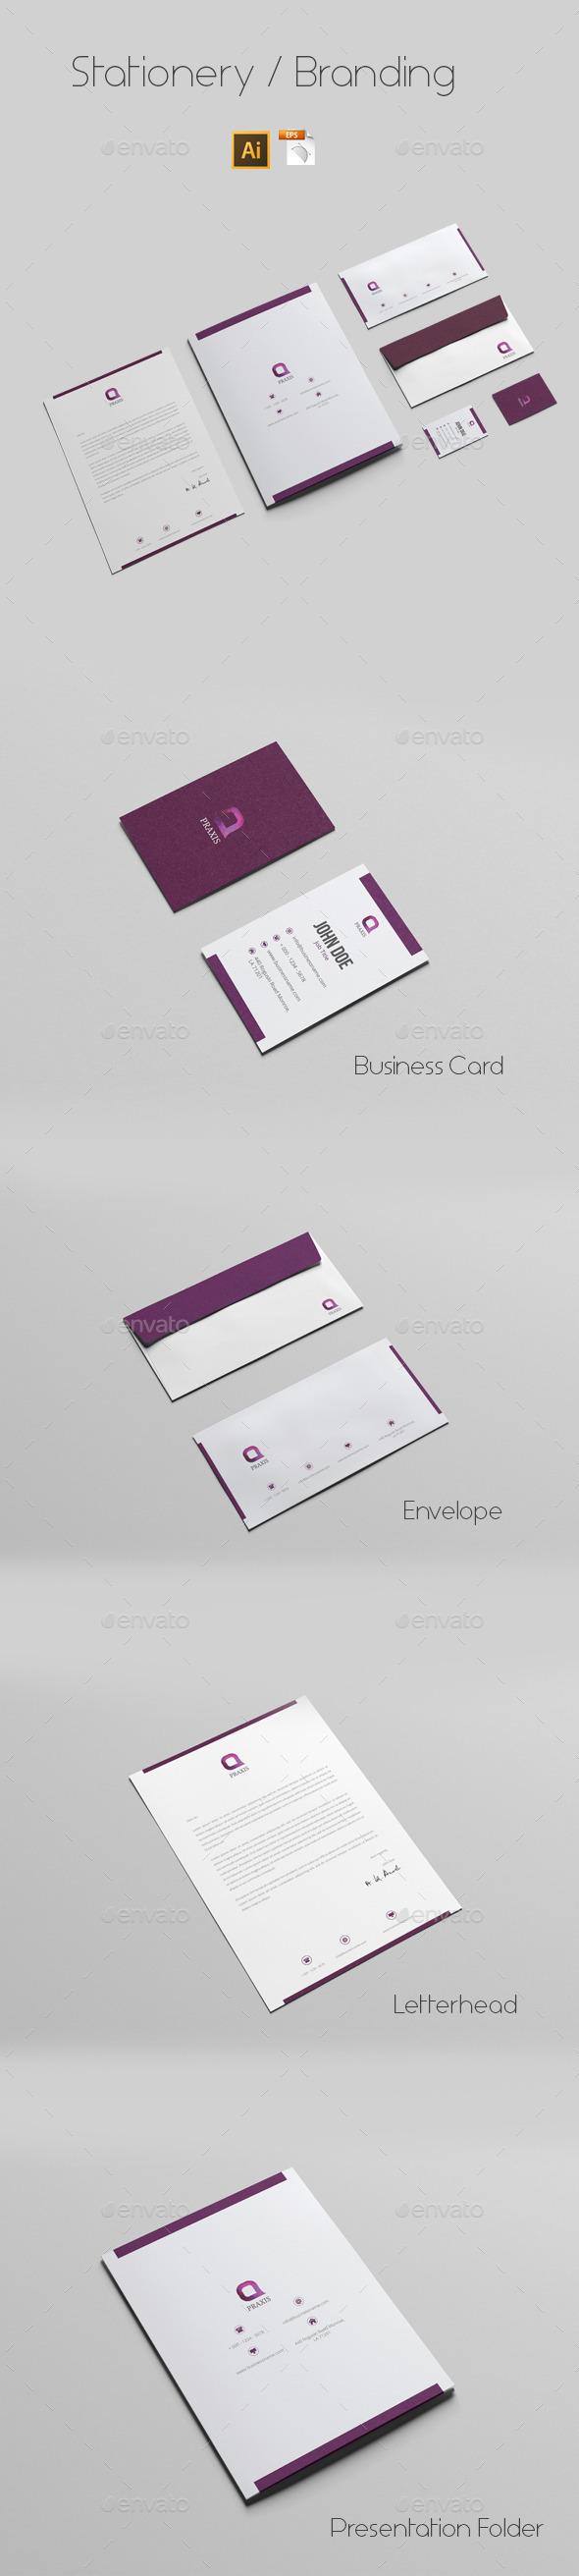 GraphicRiver Stationery Branding 9668804